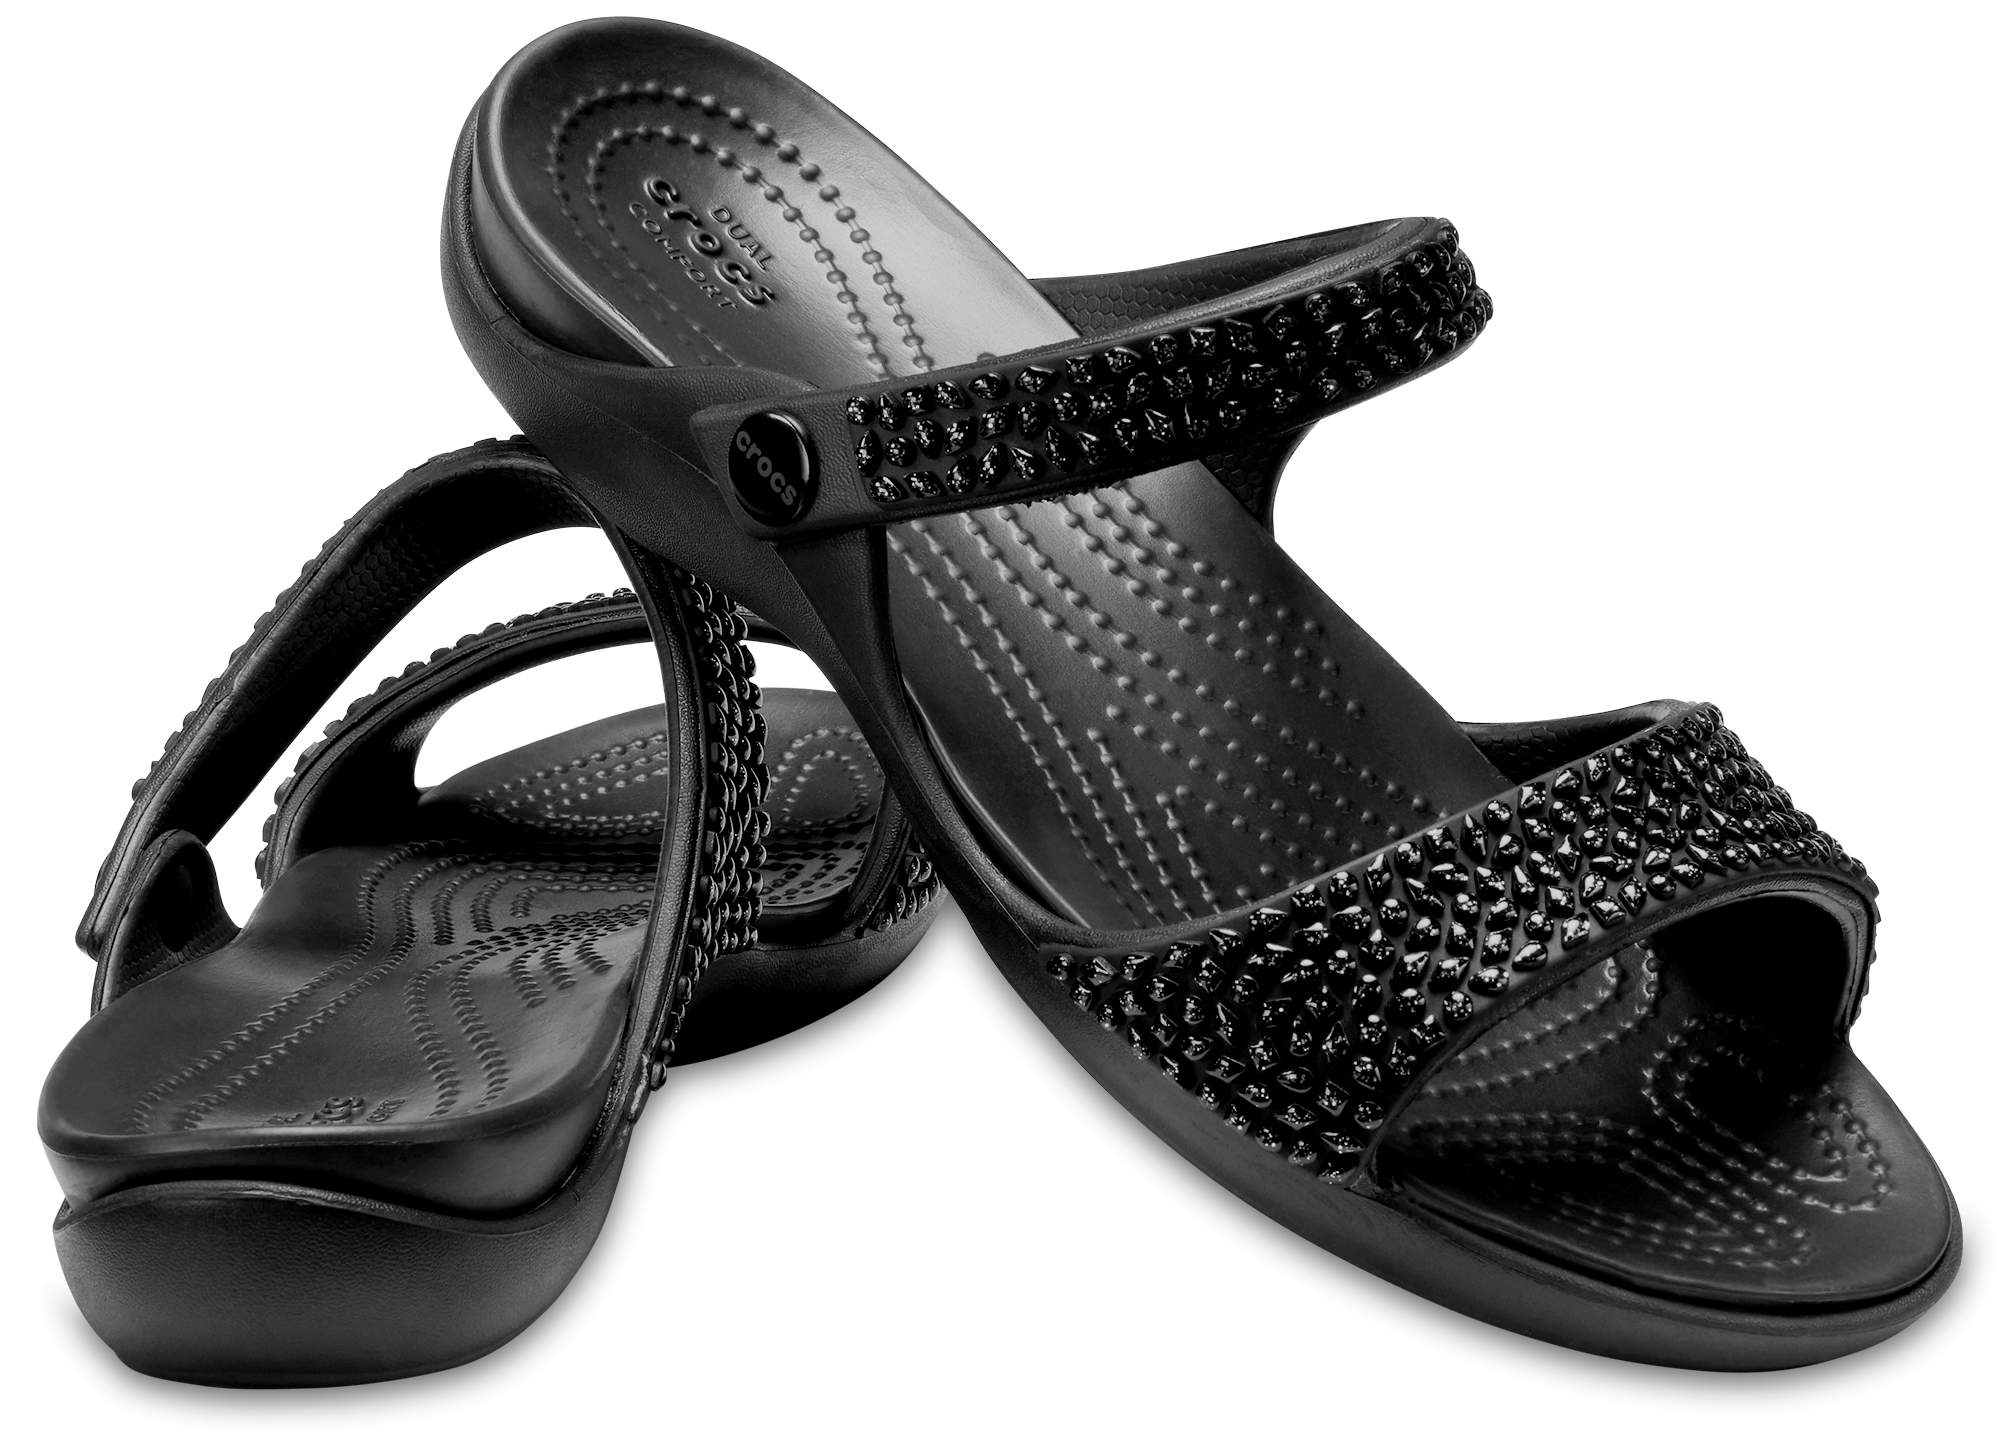 Crocs Women's Cleo V Diamante Sandals Black 205102-060